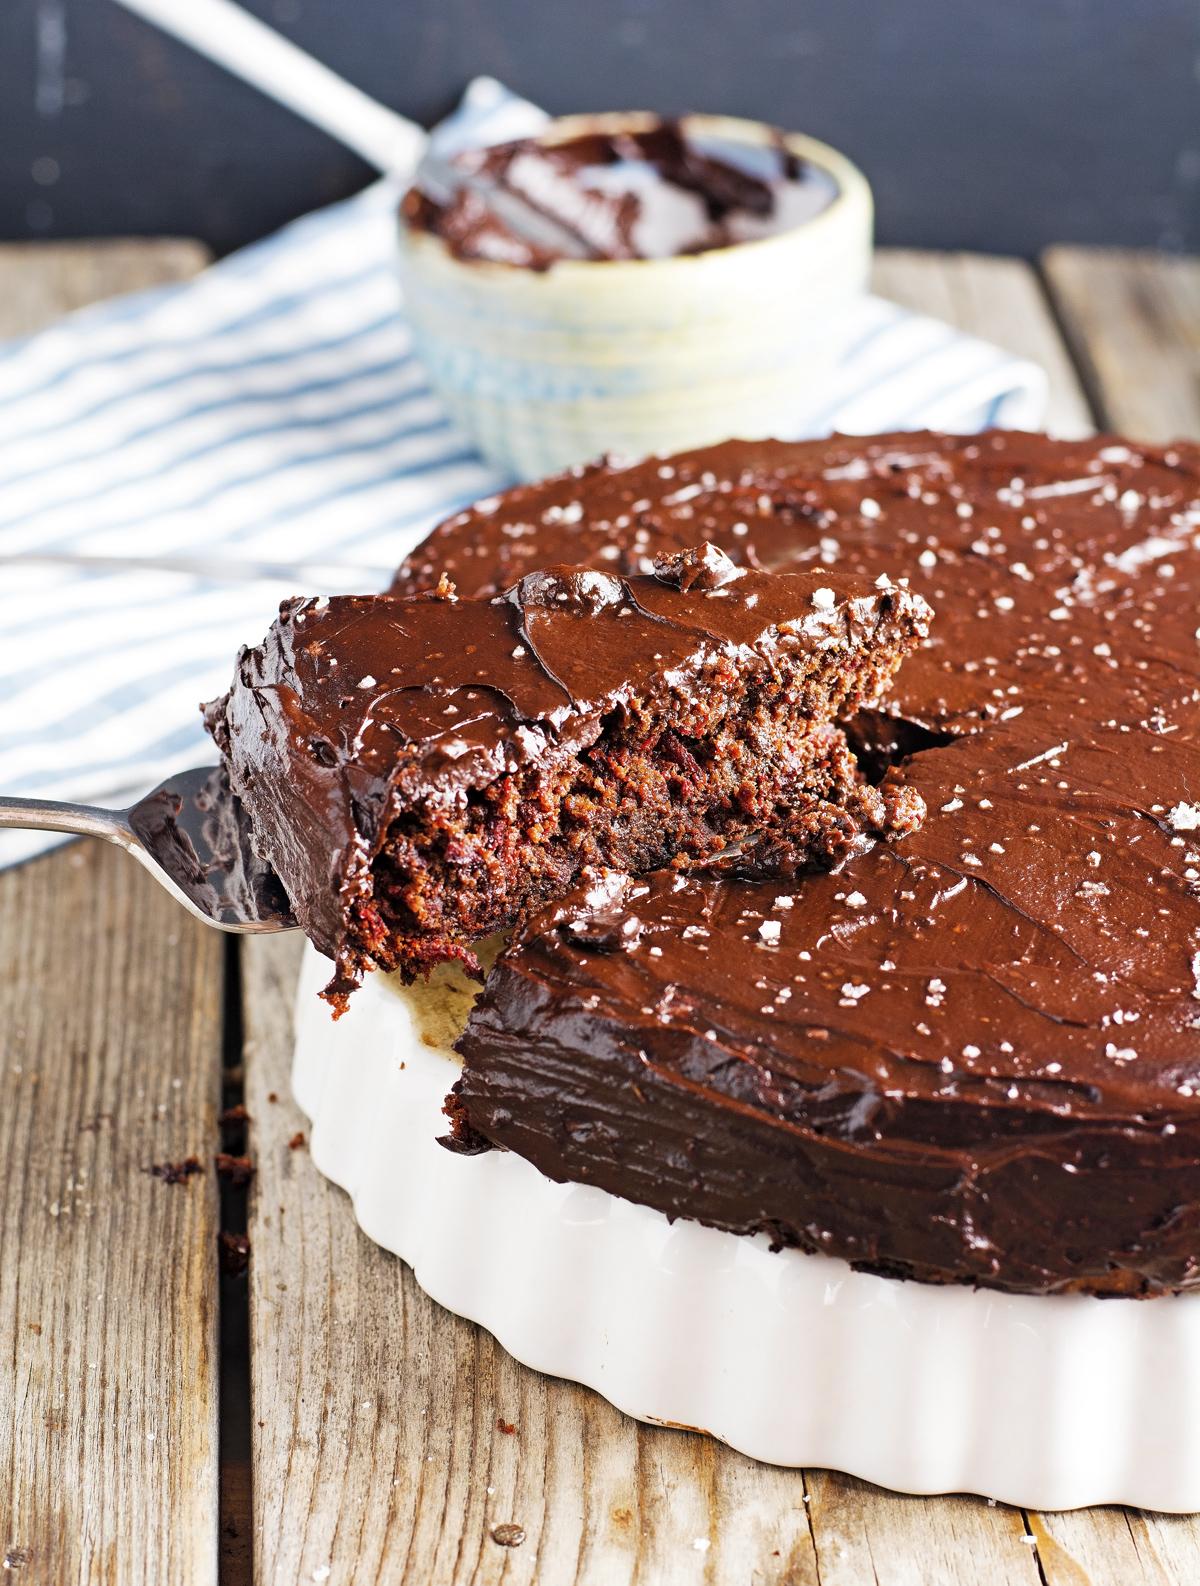 (Flourless) Chocolate Beet Cake with Chocolate Avocado Frosting